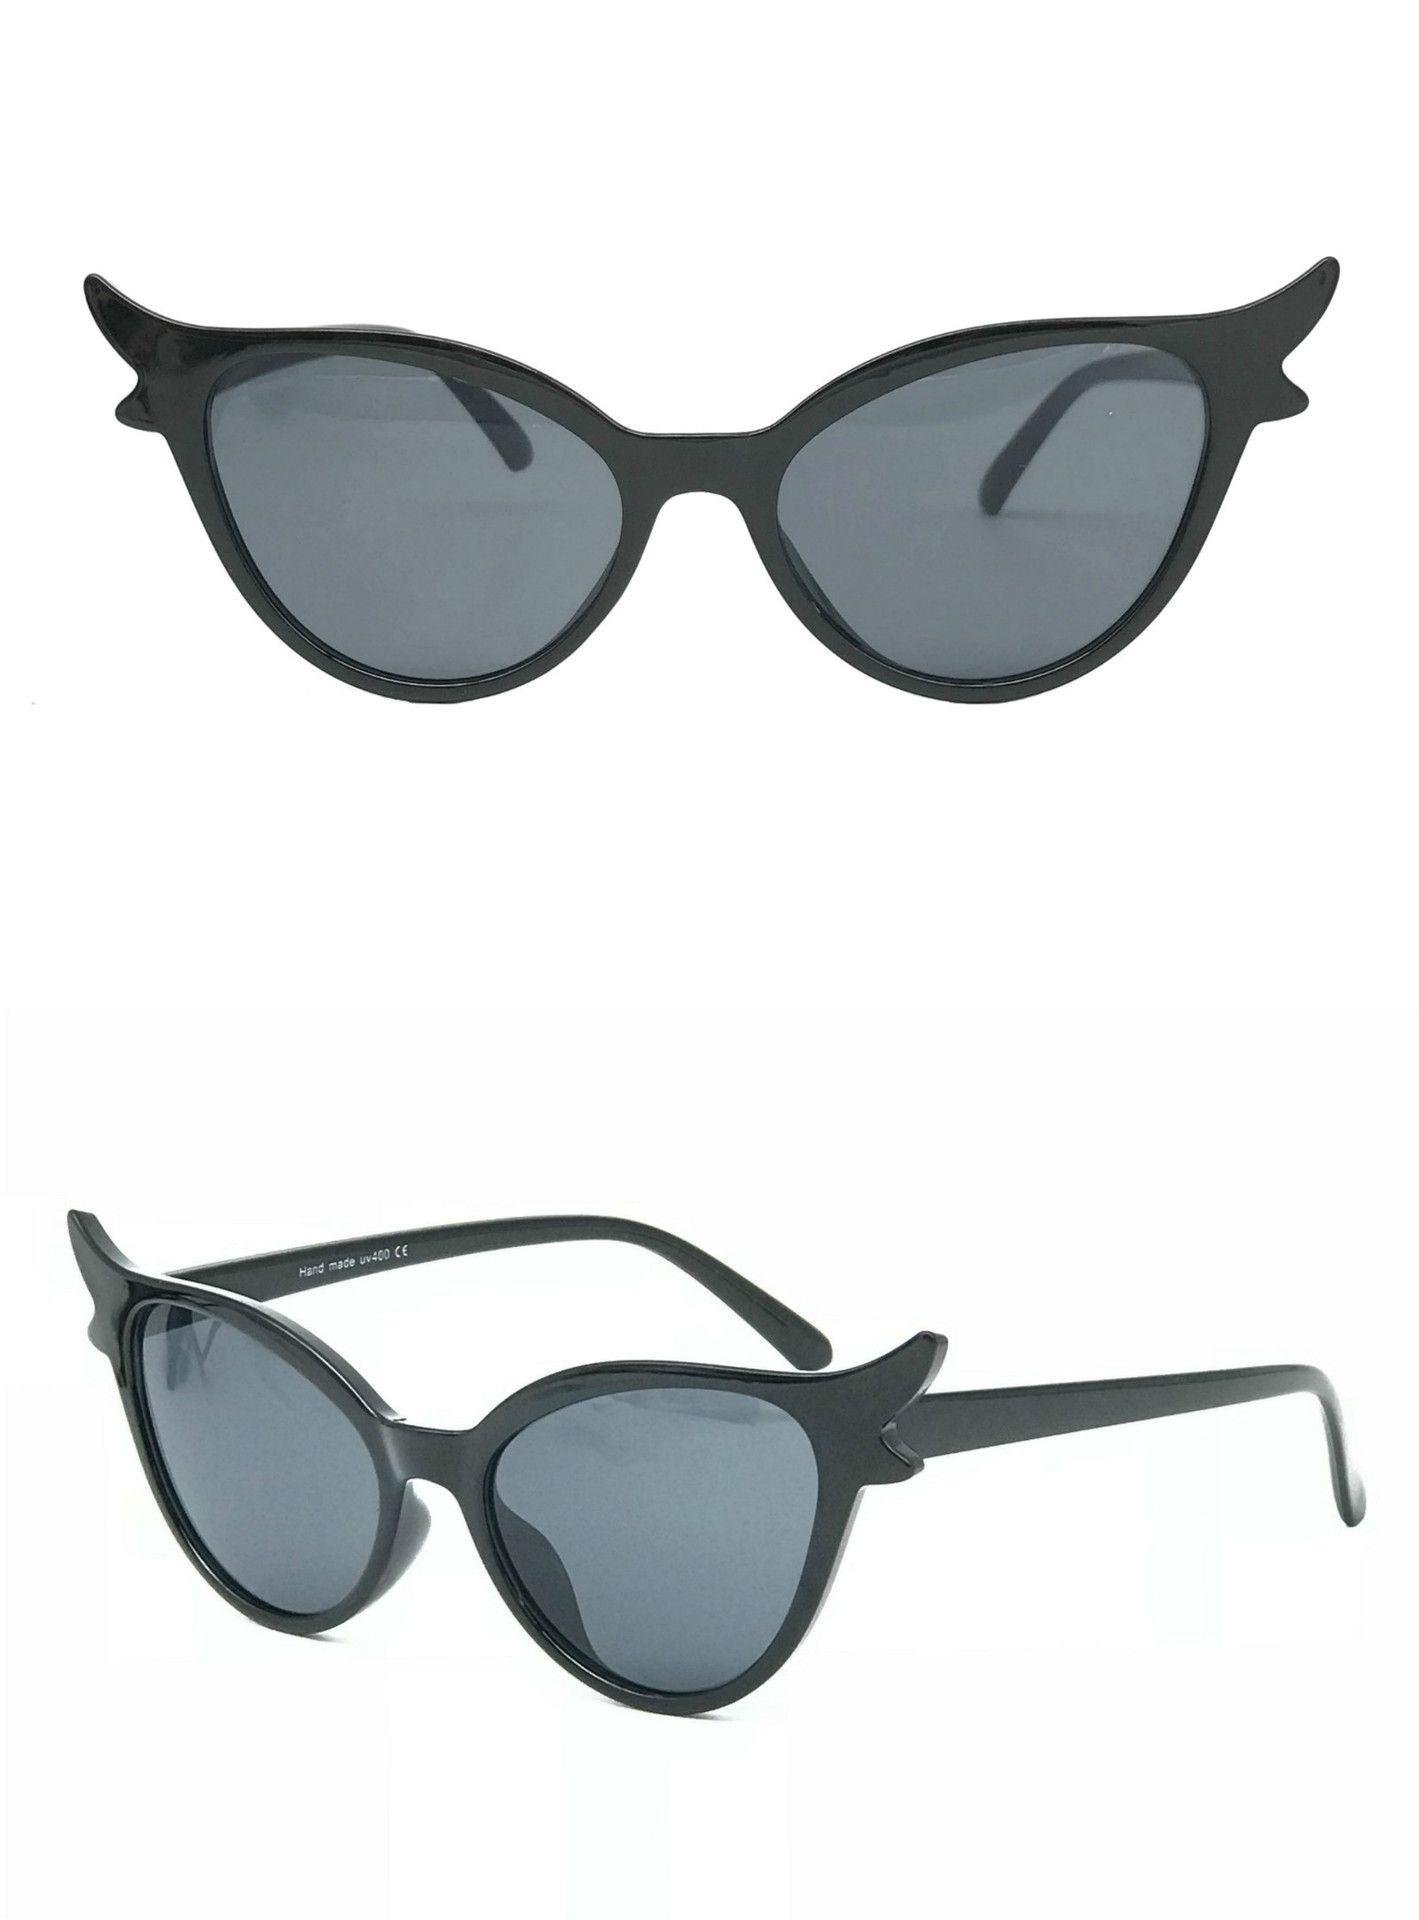 b9d2ef00e2 2018 Fashion Cateye Triangle Sunglasses Sexy Women Vintage Cat Eye ...